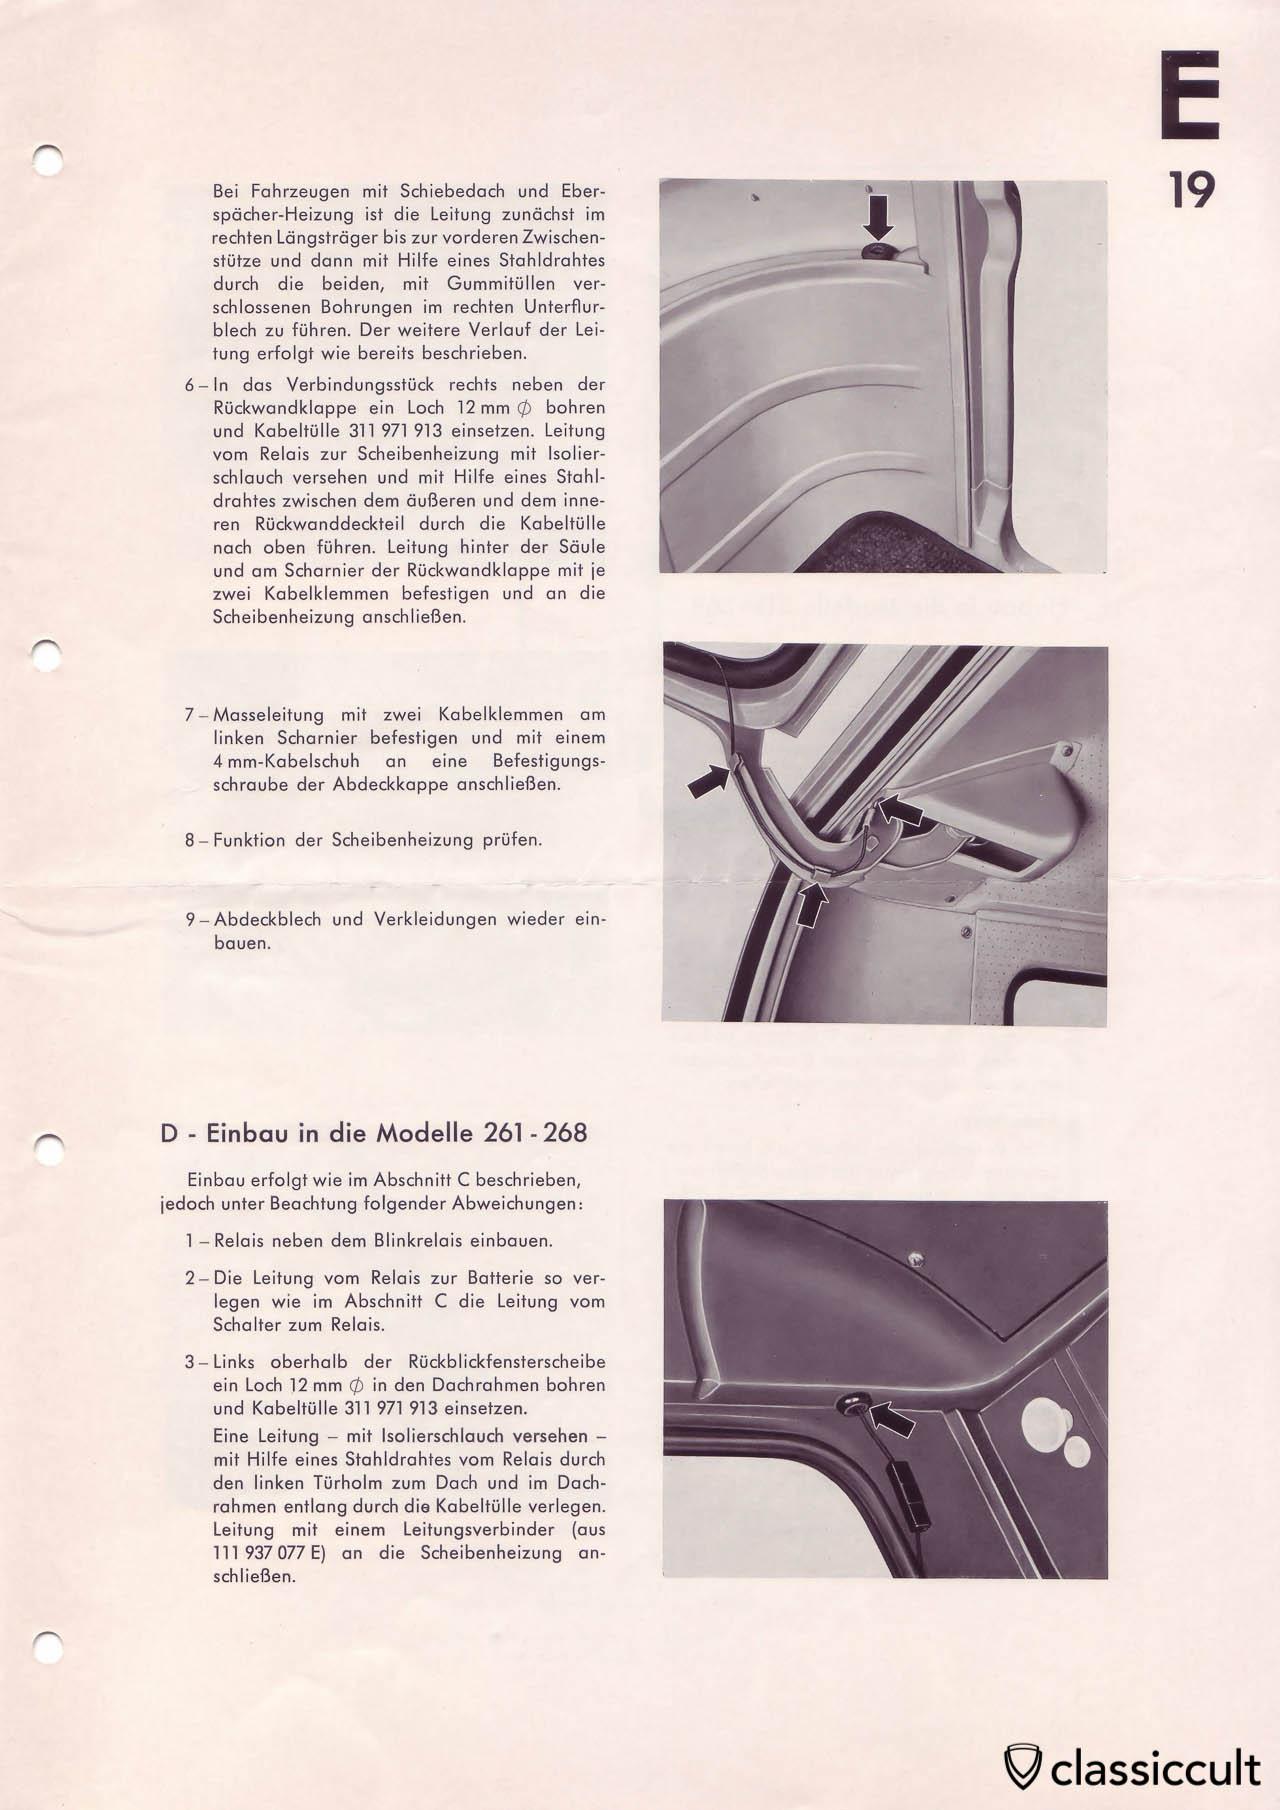 Heated rear window in VW Bus mounting instructions.